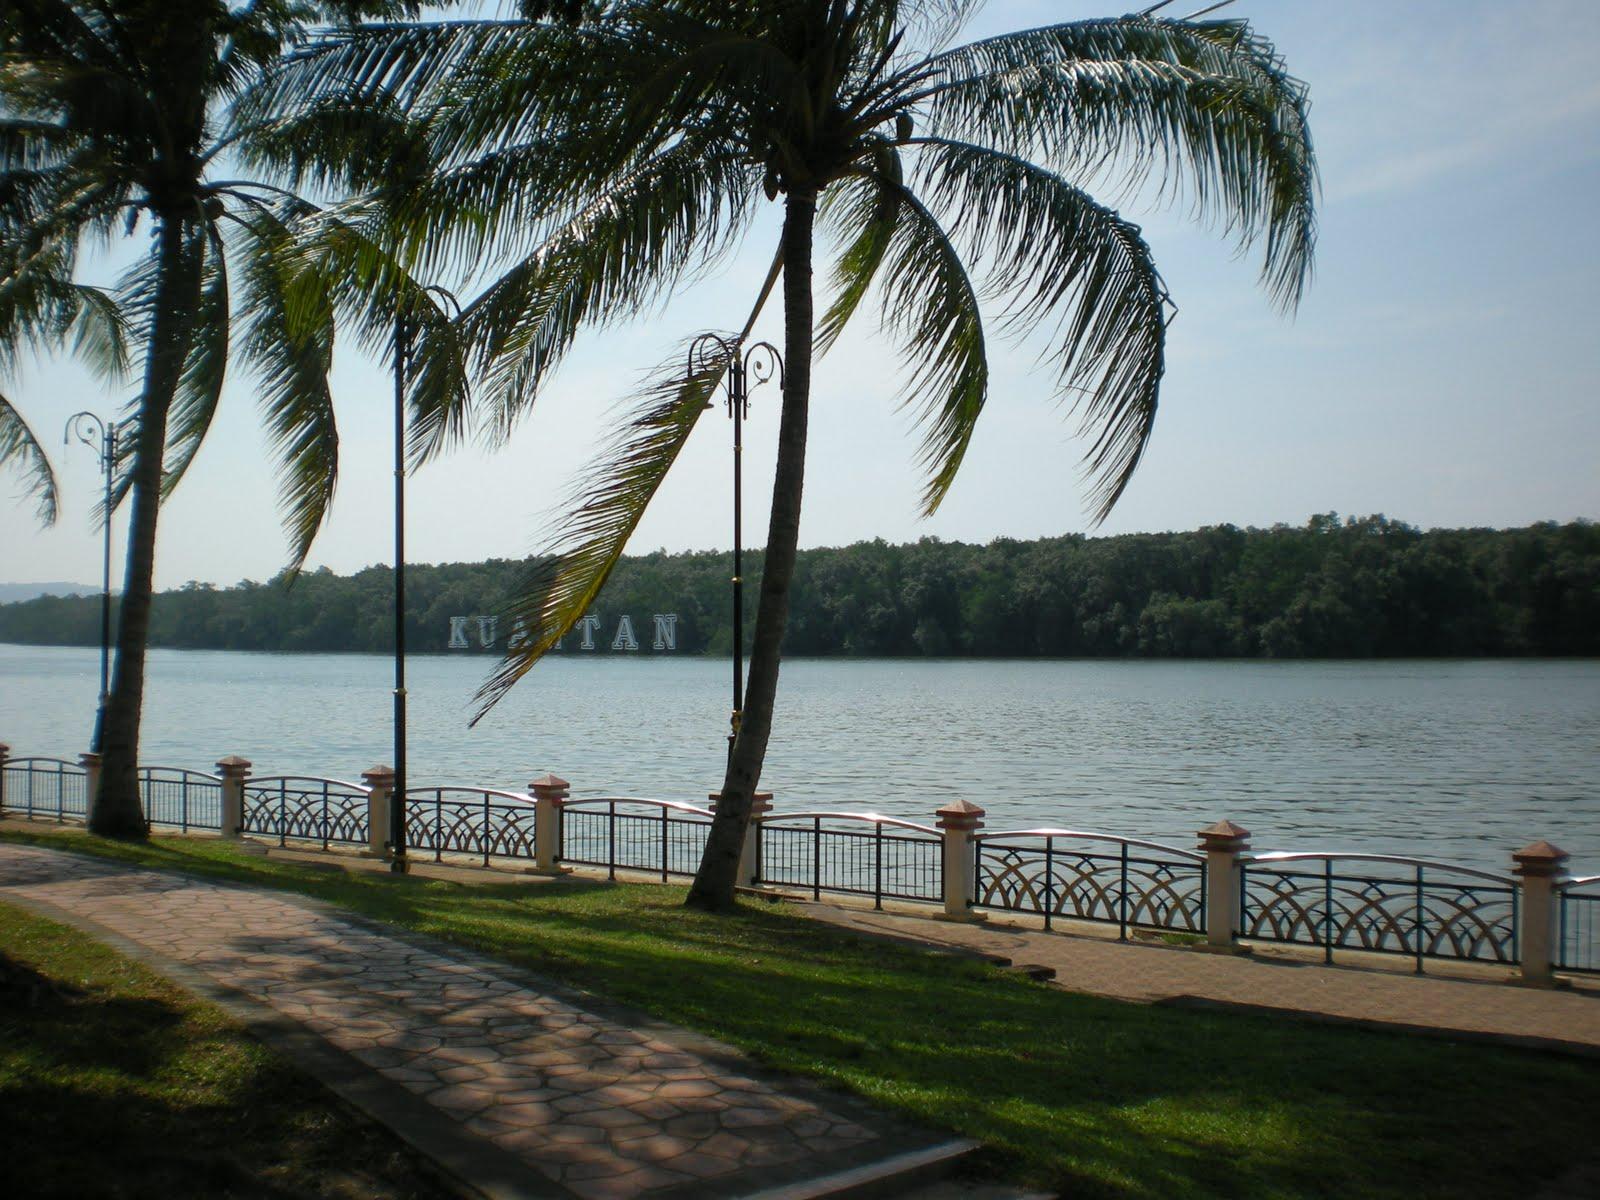 KOI ORANG PAHANG Tebing Sungai Kuantan